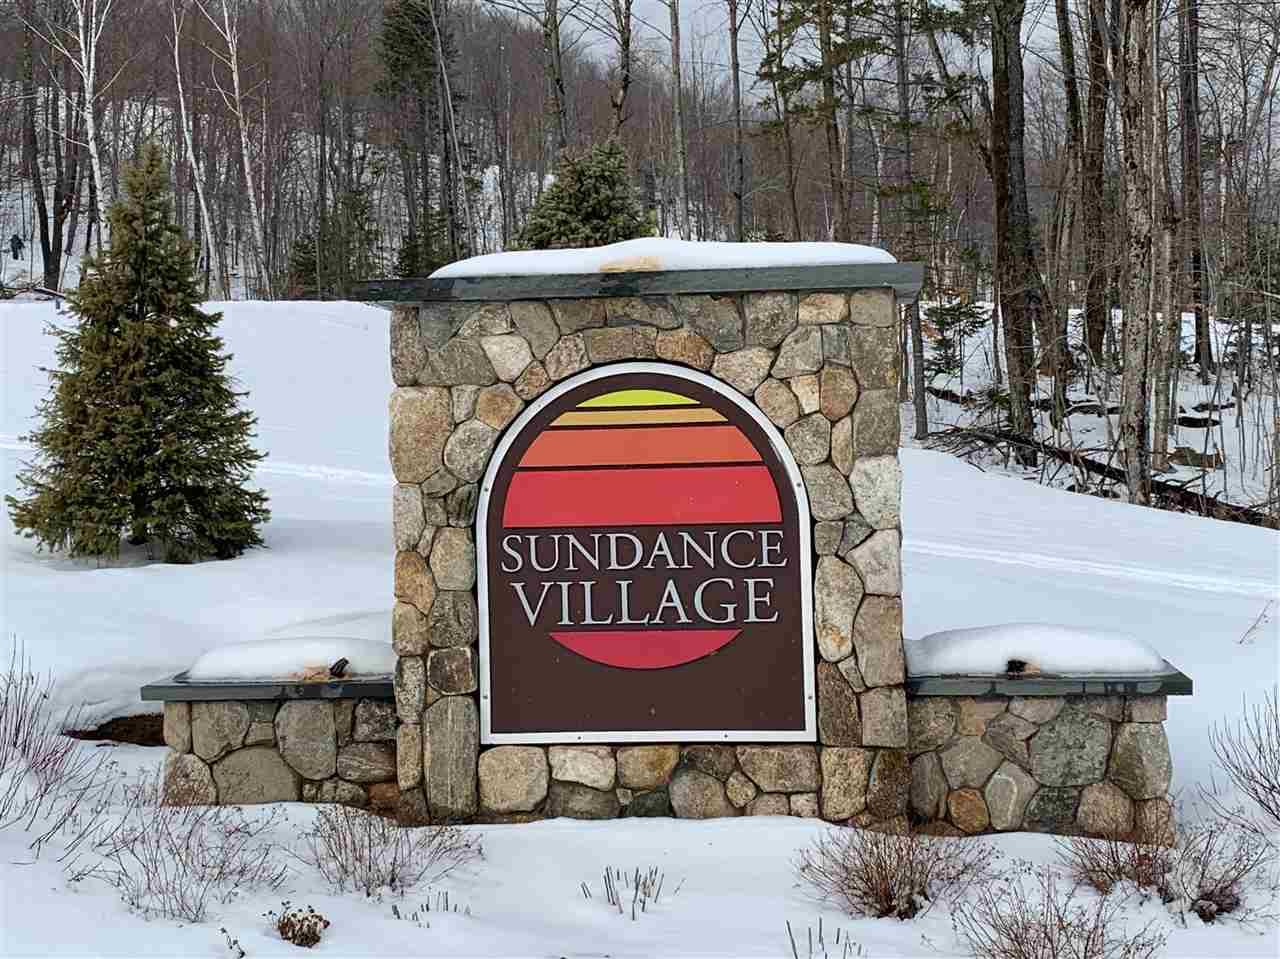 Mount-Snow-Real-Estate-4500044-2